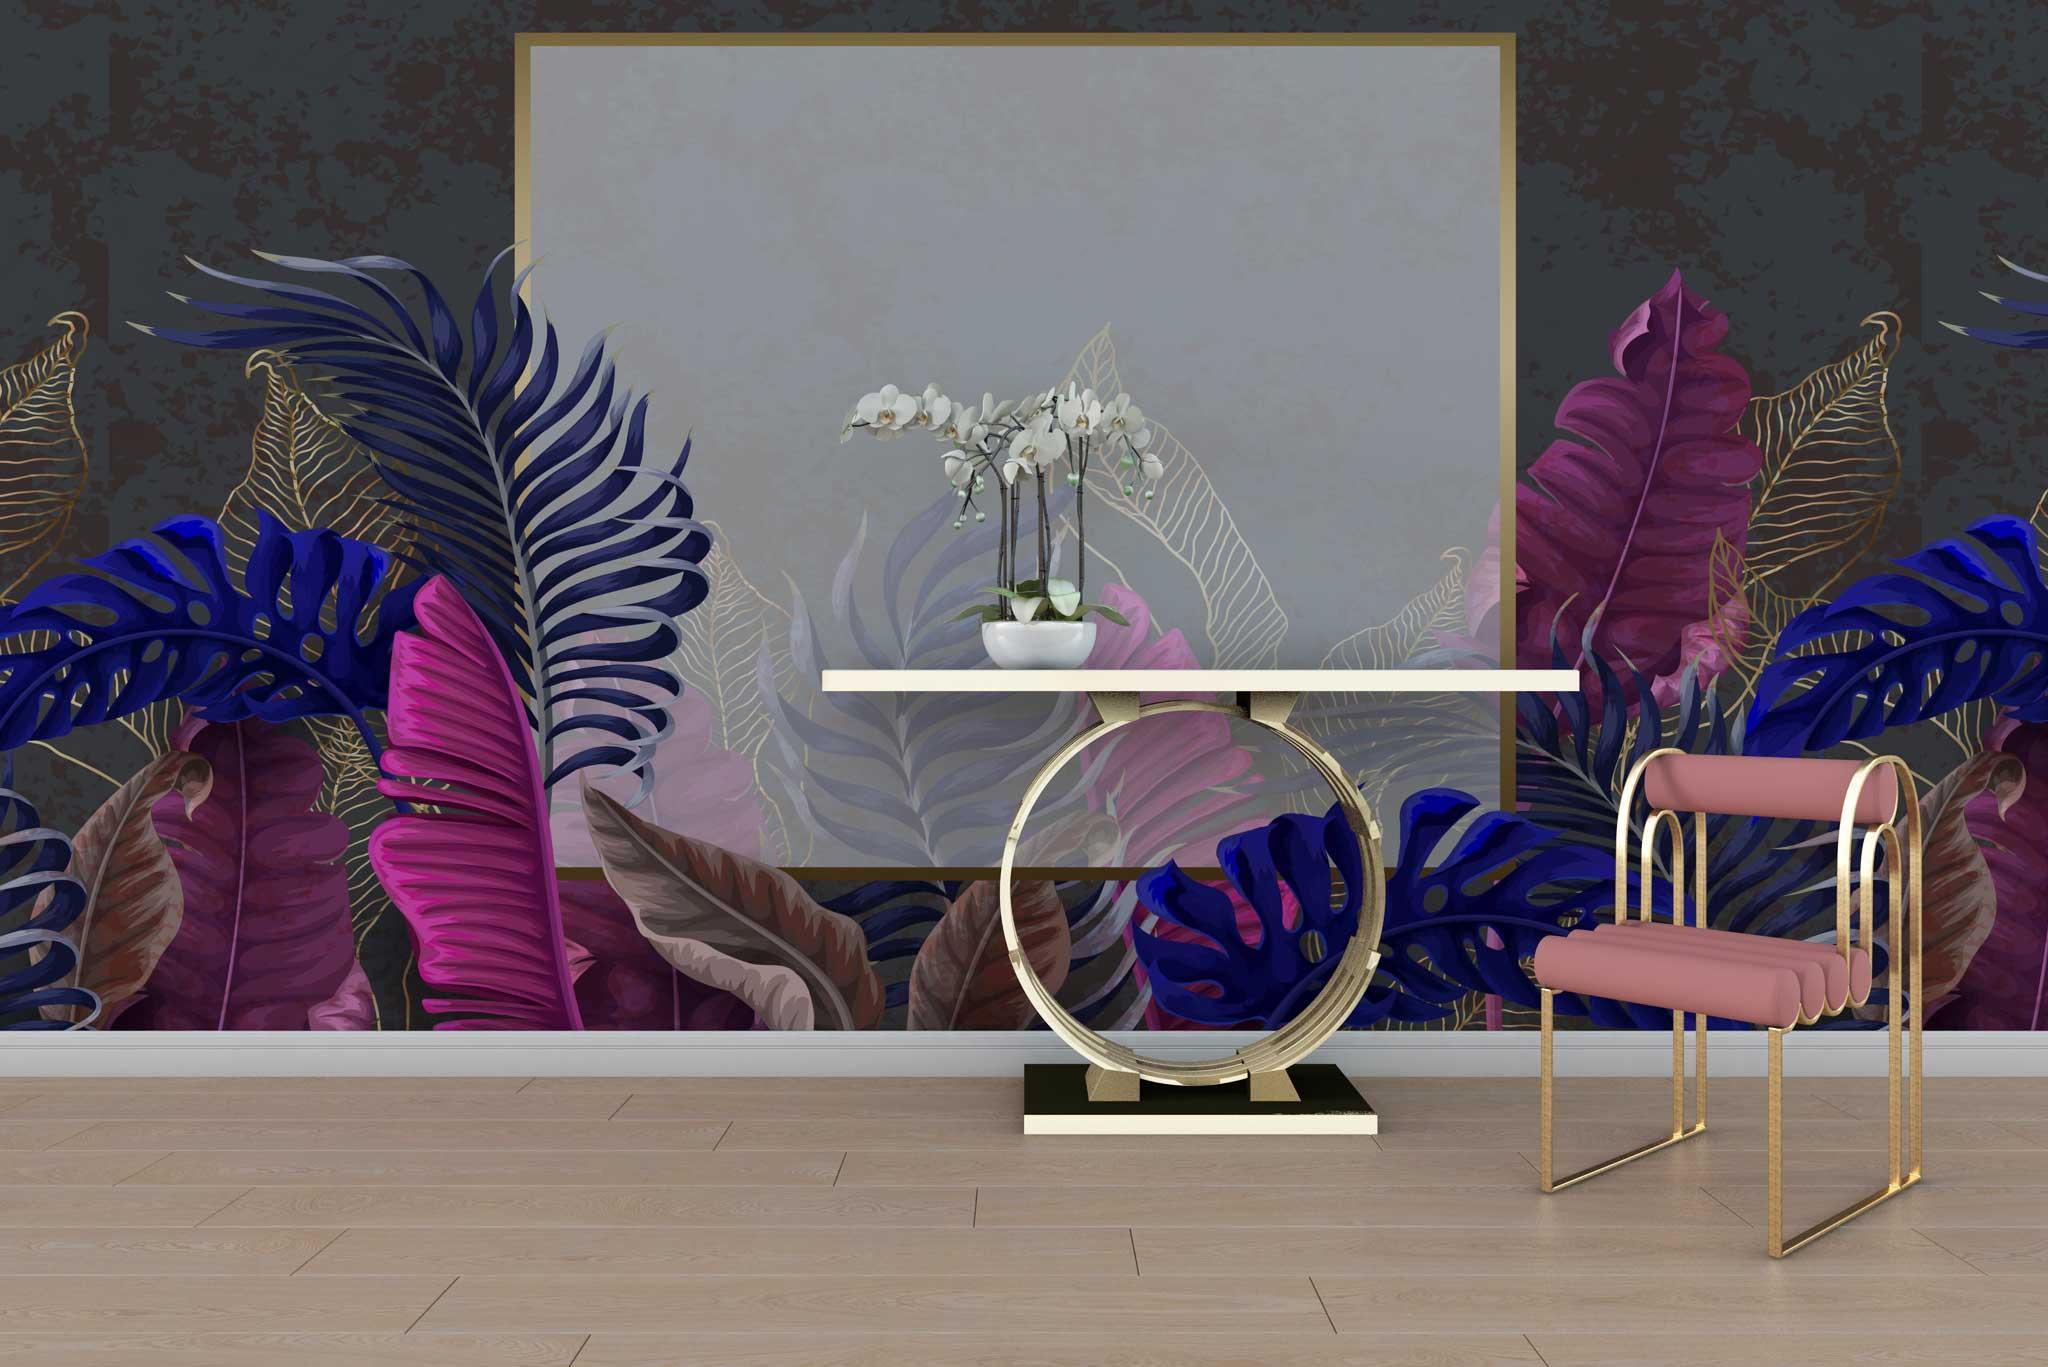 tapet-fototapet-special-personalizat-customizabil-comanda-bucuresti-daring-prints-model-motiv-vegetal-frunze-exotice-luxuriant-cadran-chenar-auriu-fundal-negru-multicolor